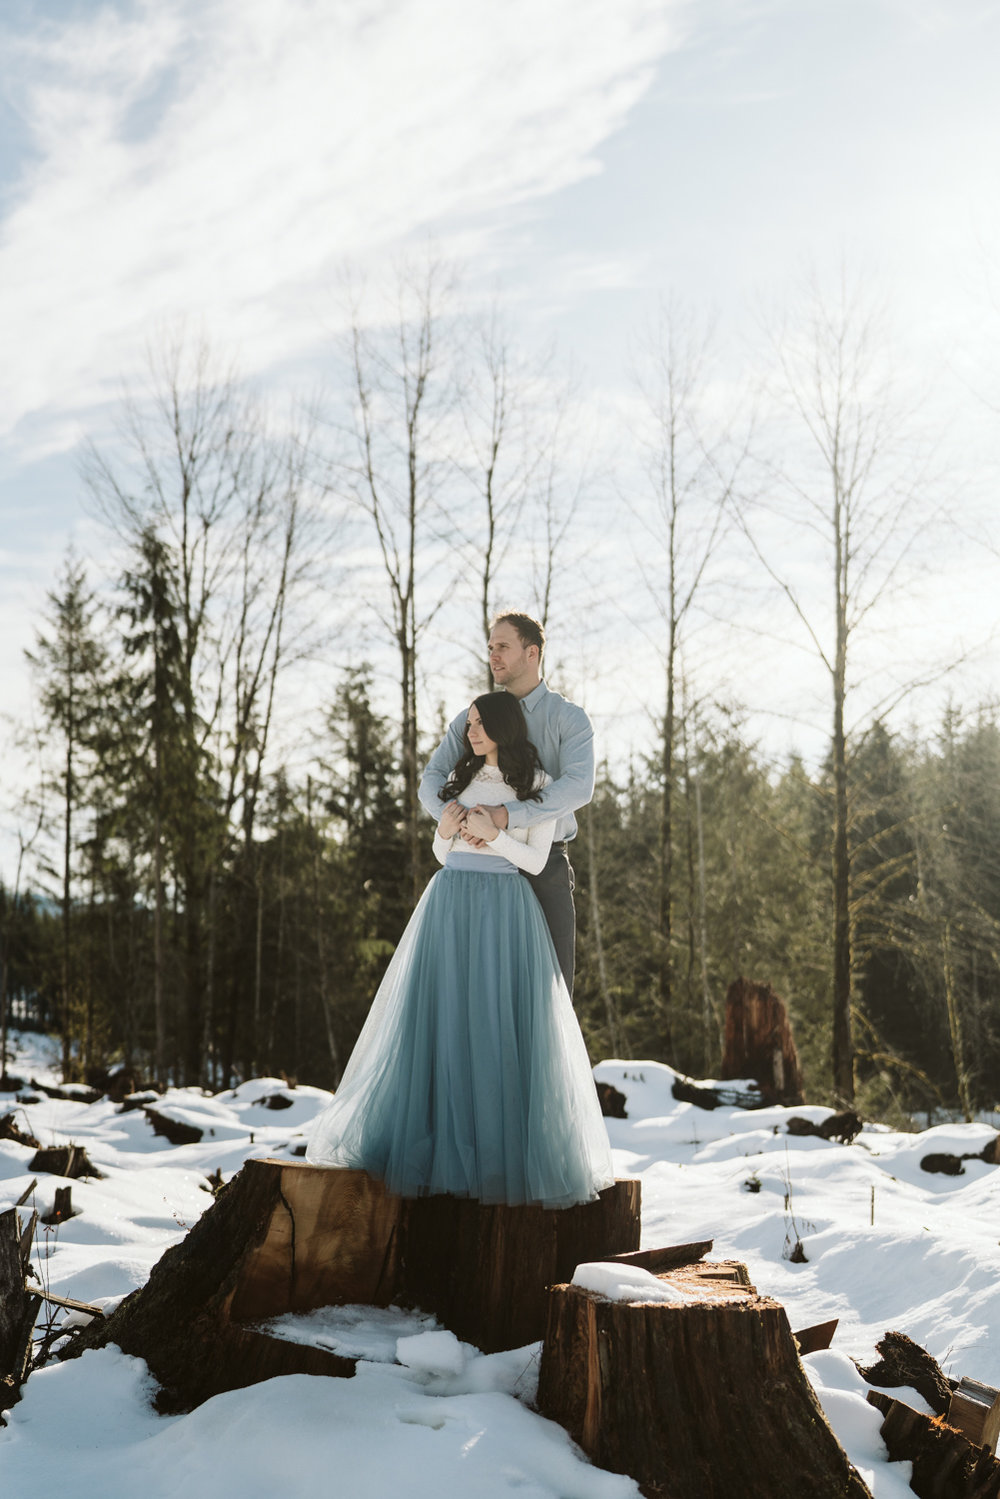 April Yentas Photography - Ethan & Nerissa-28.jpg